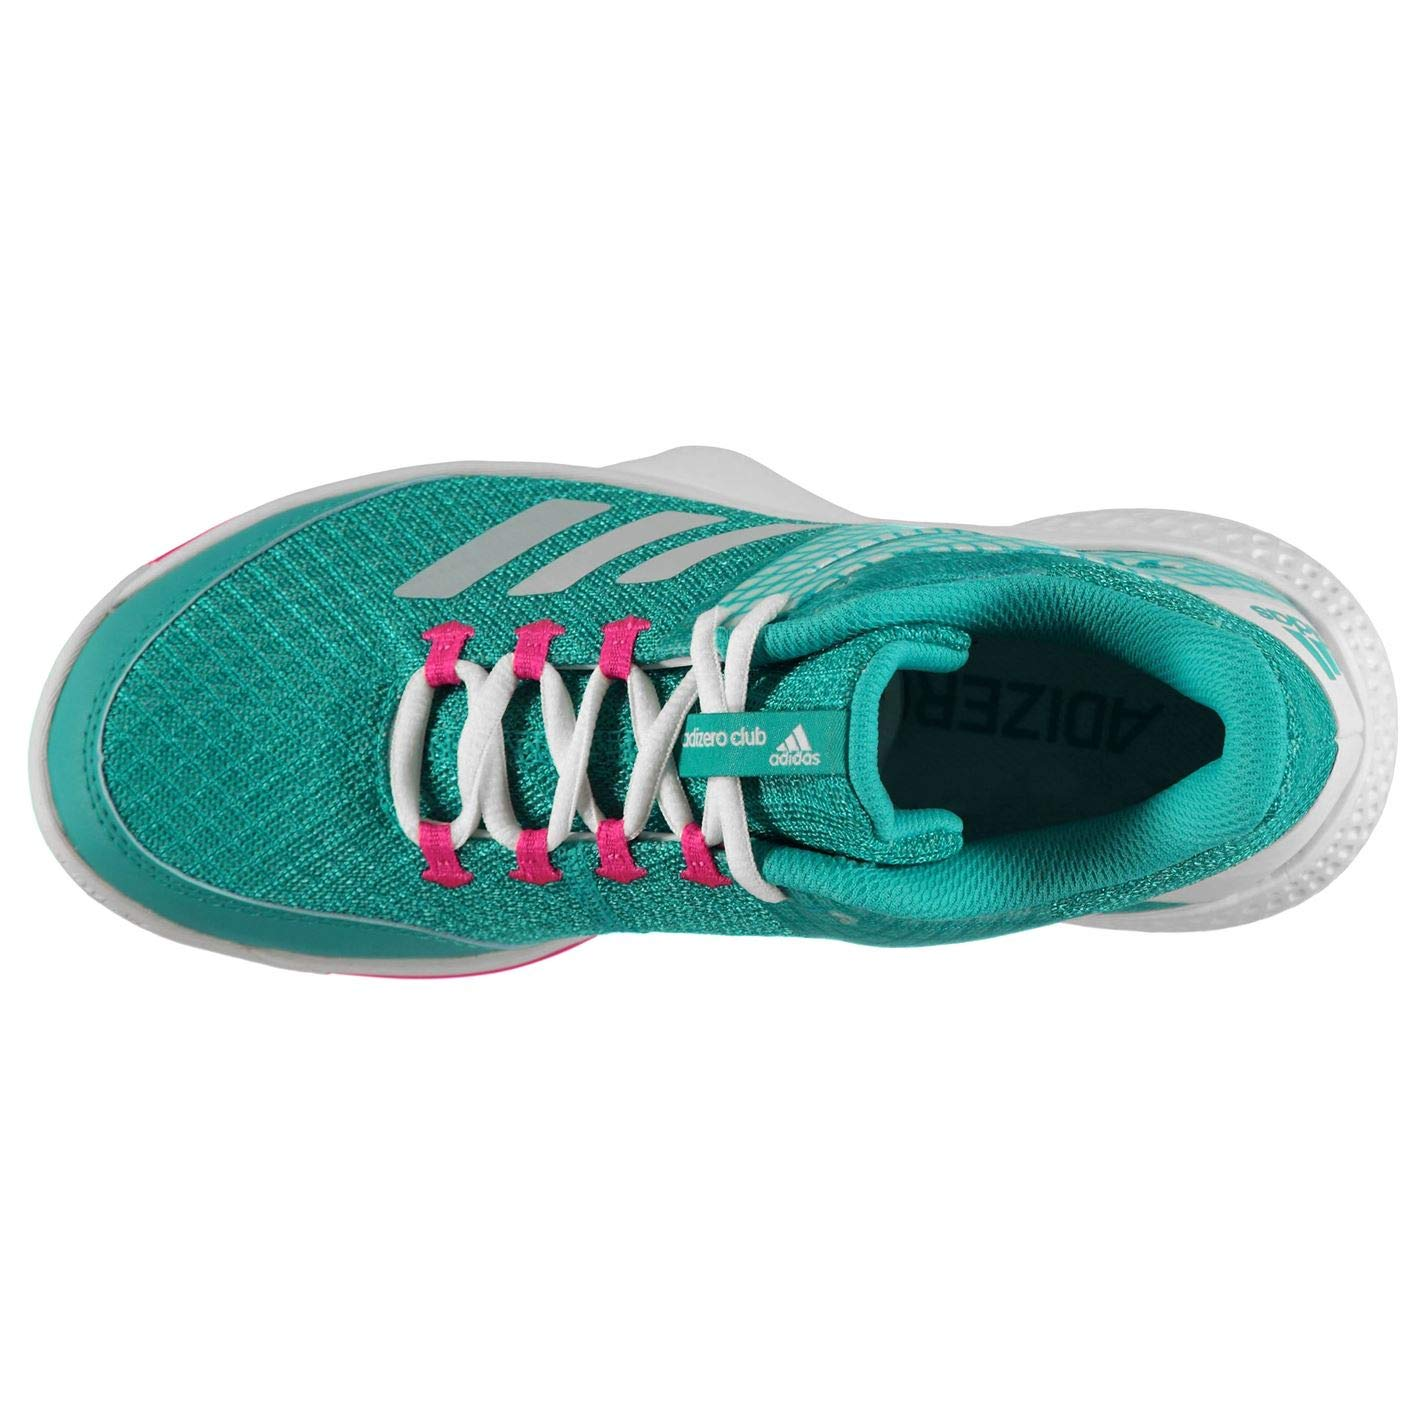 W Club Tennis 2 Chaussures de et Adidas Chaussures Femme Adizero Sacs tSw5qB